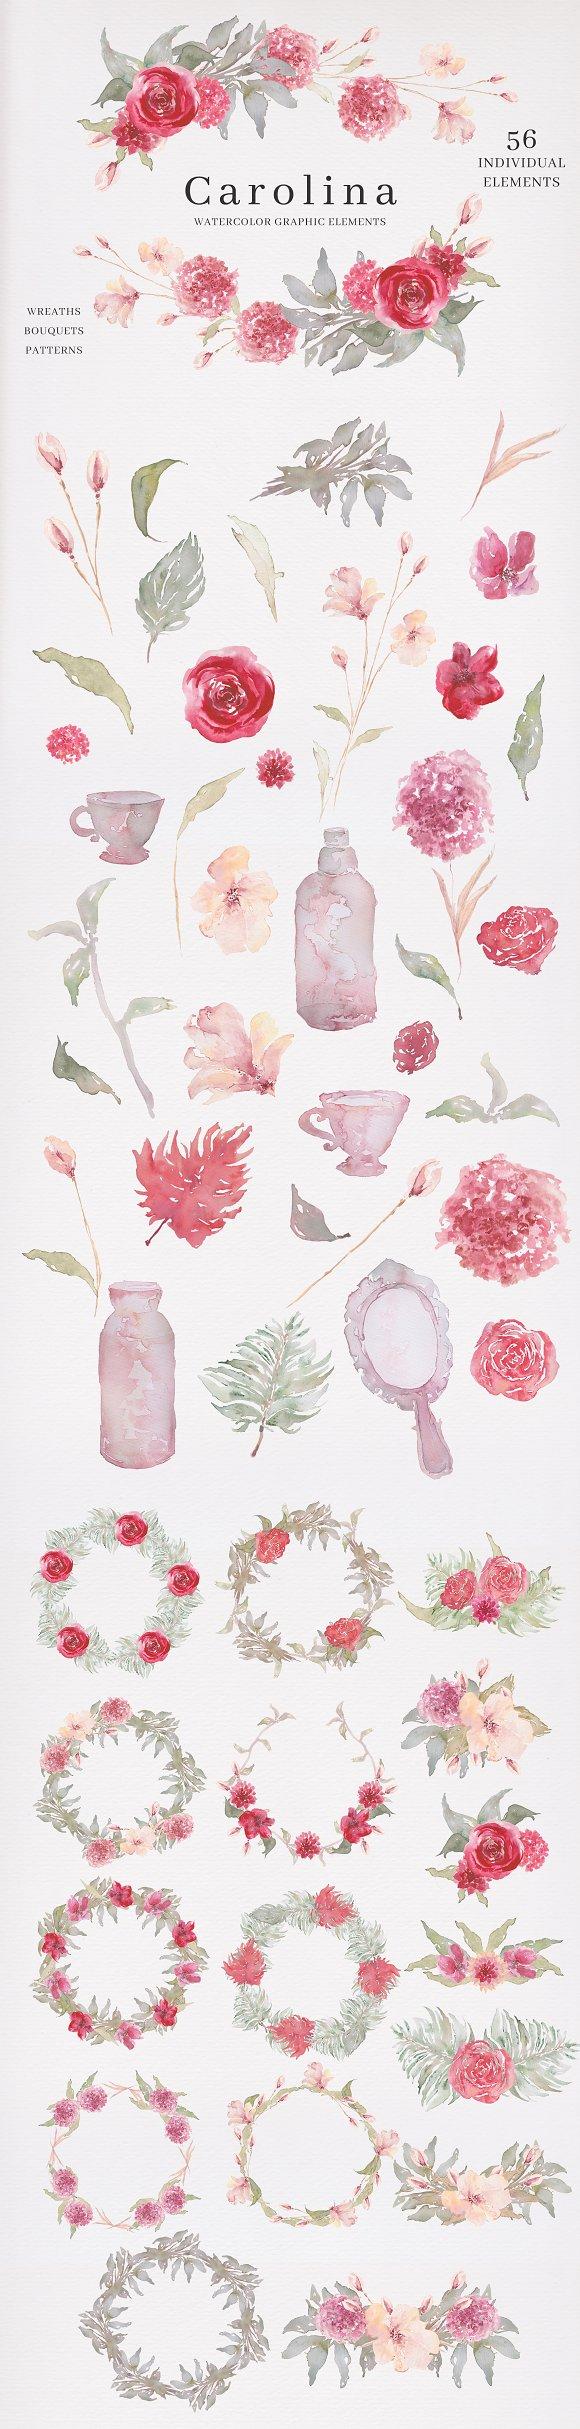 Watercolor Graphic Elements-Carolina